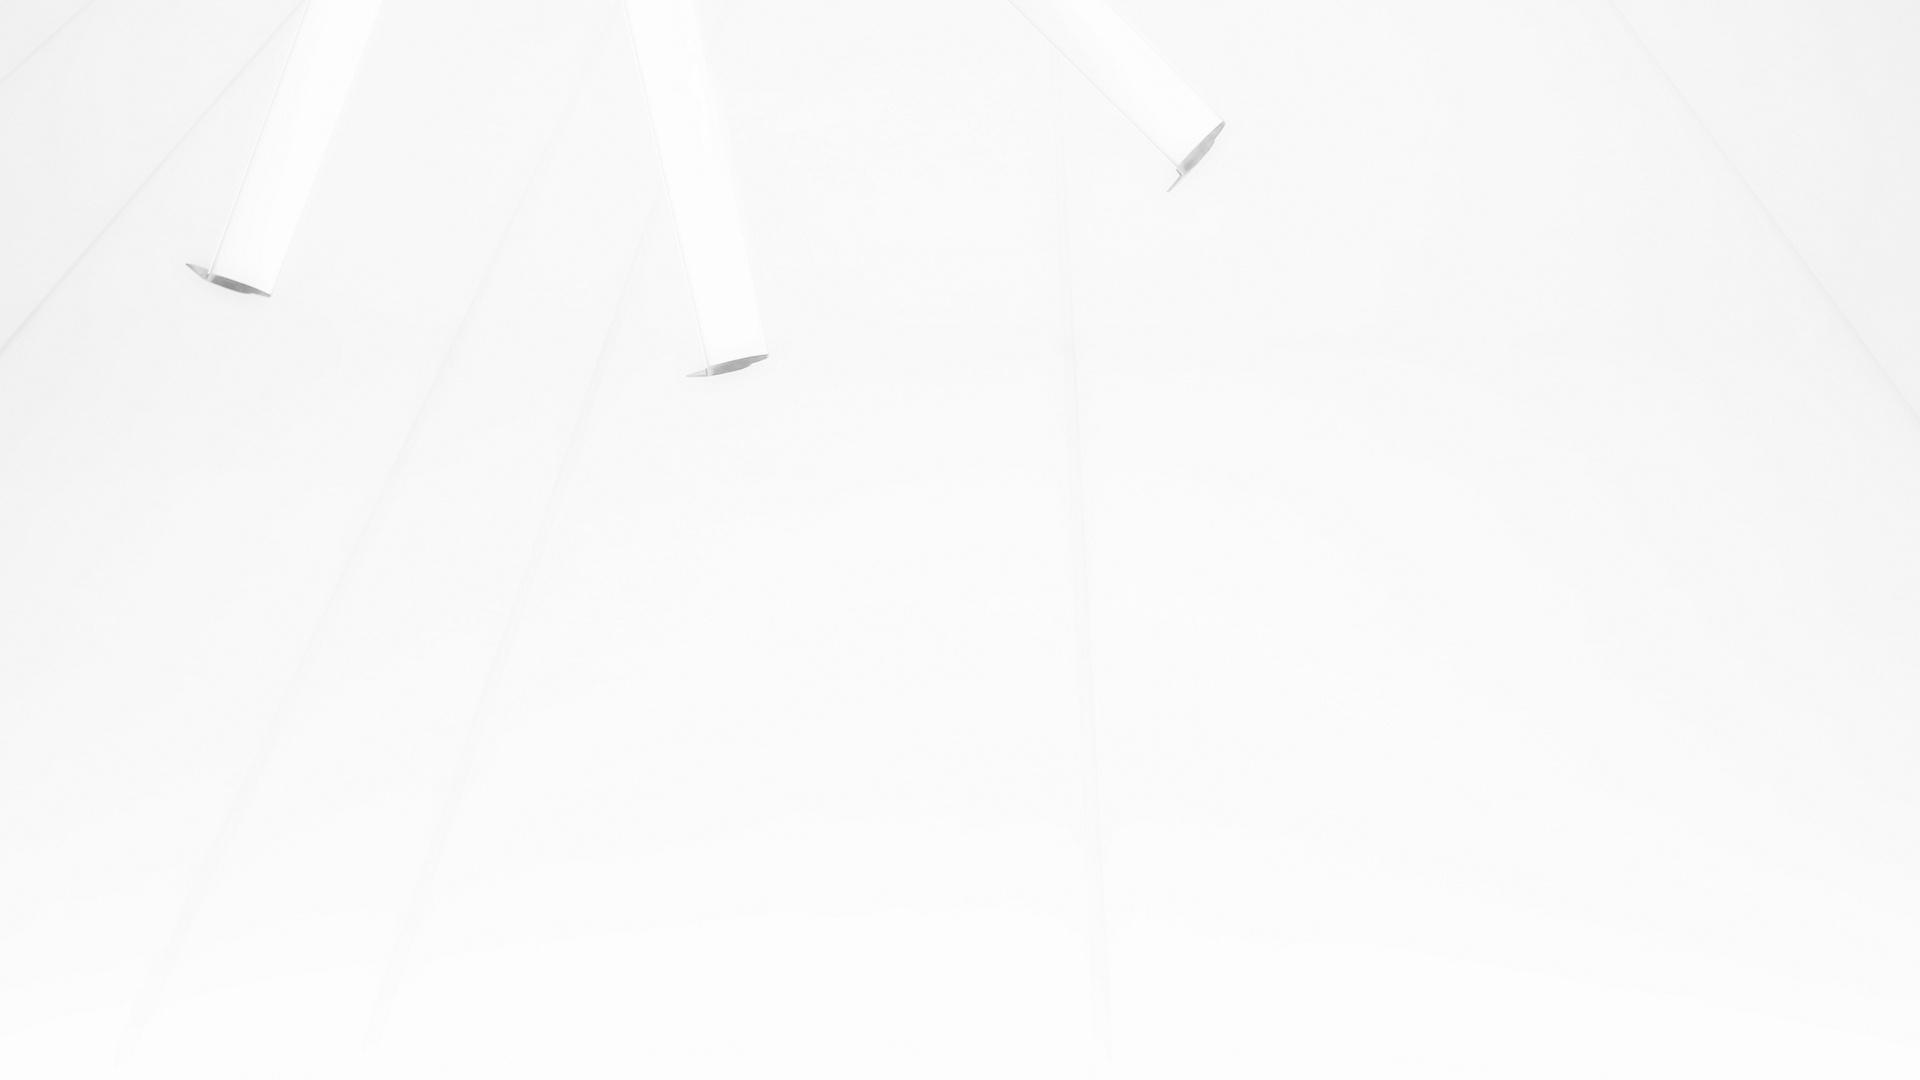 Minimal white desktop wallpapers - ojdo